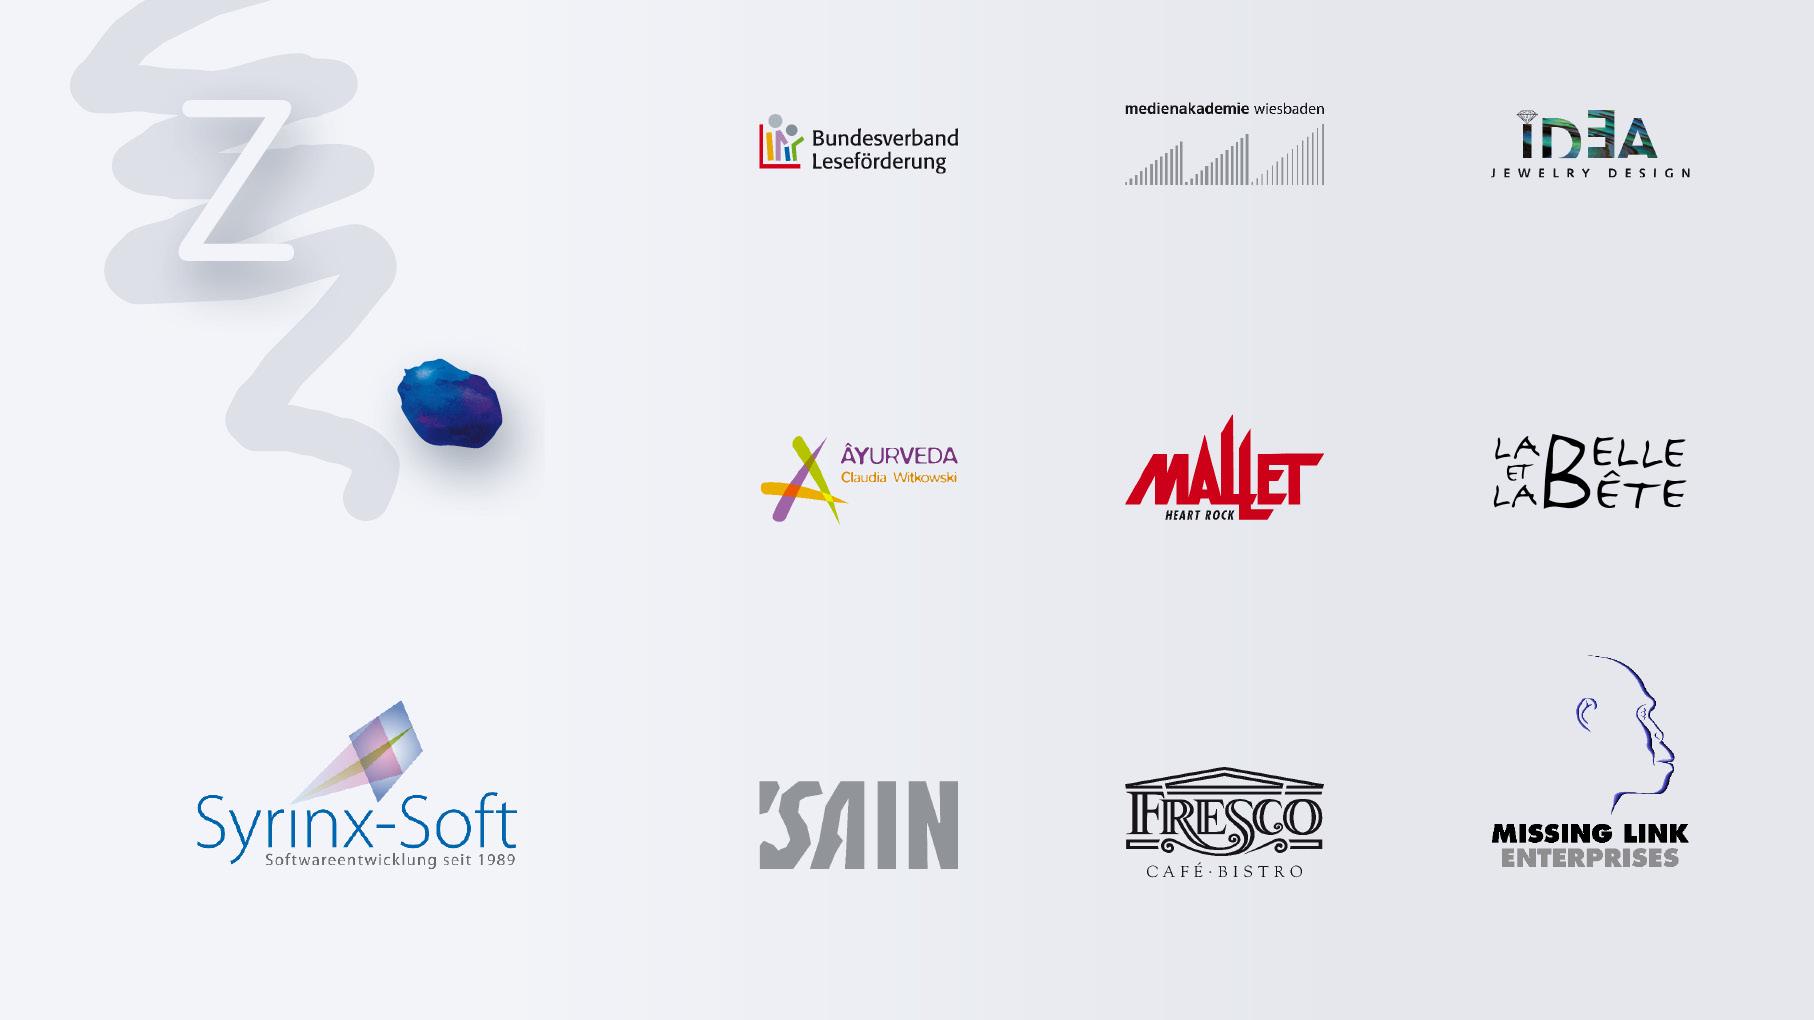 Logos made by zehmdesign 1981 bis 2020